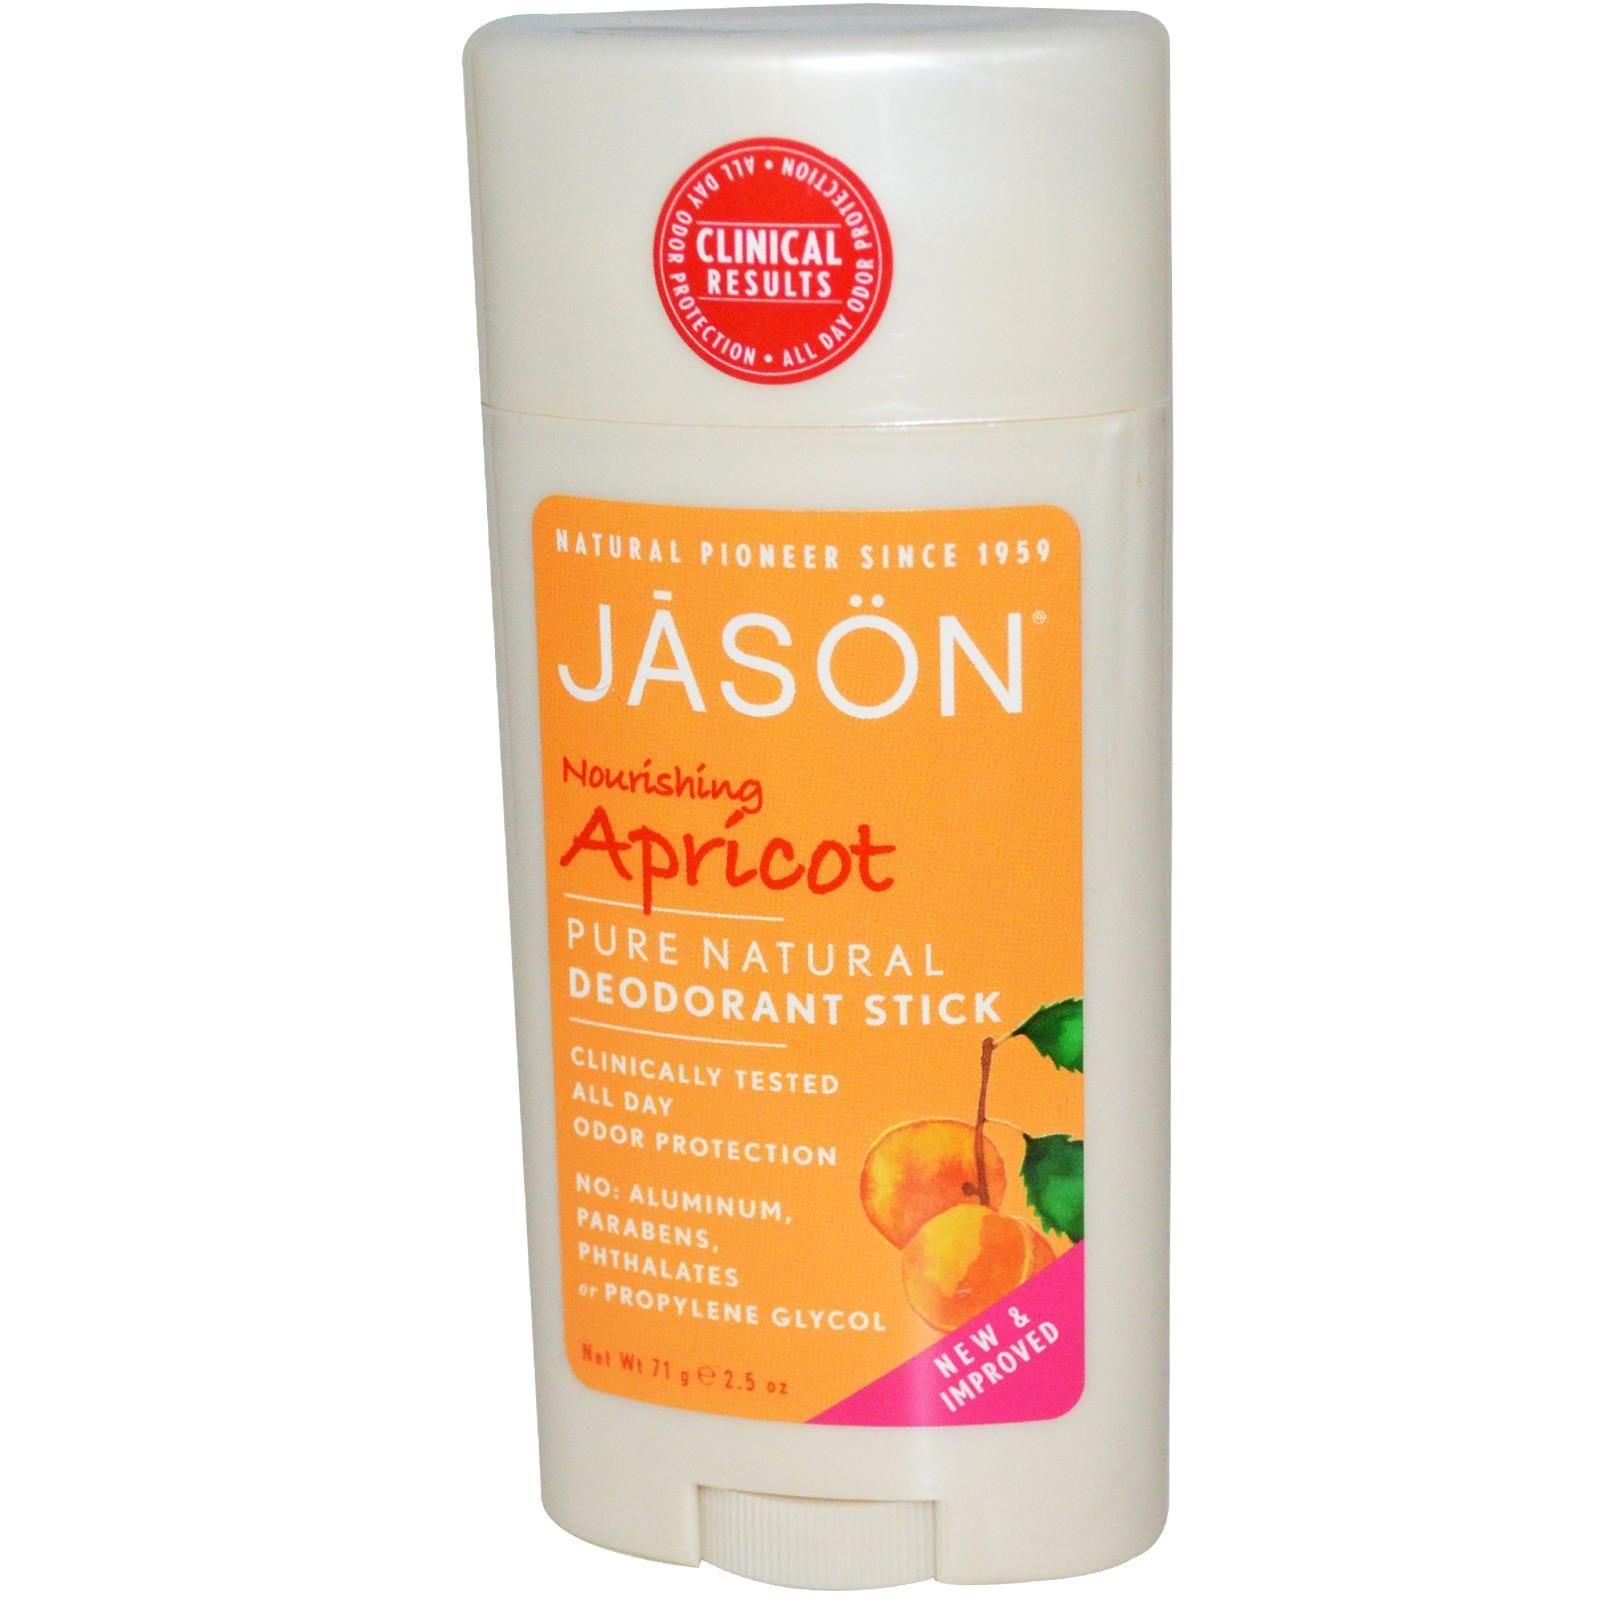 Jason Natural, Deodorant Stick, Nourishing Apricot, 2.5 oz (71 g) - iHerb.com